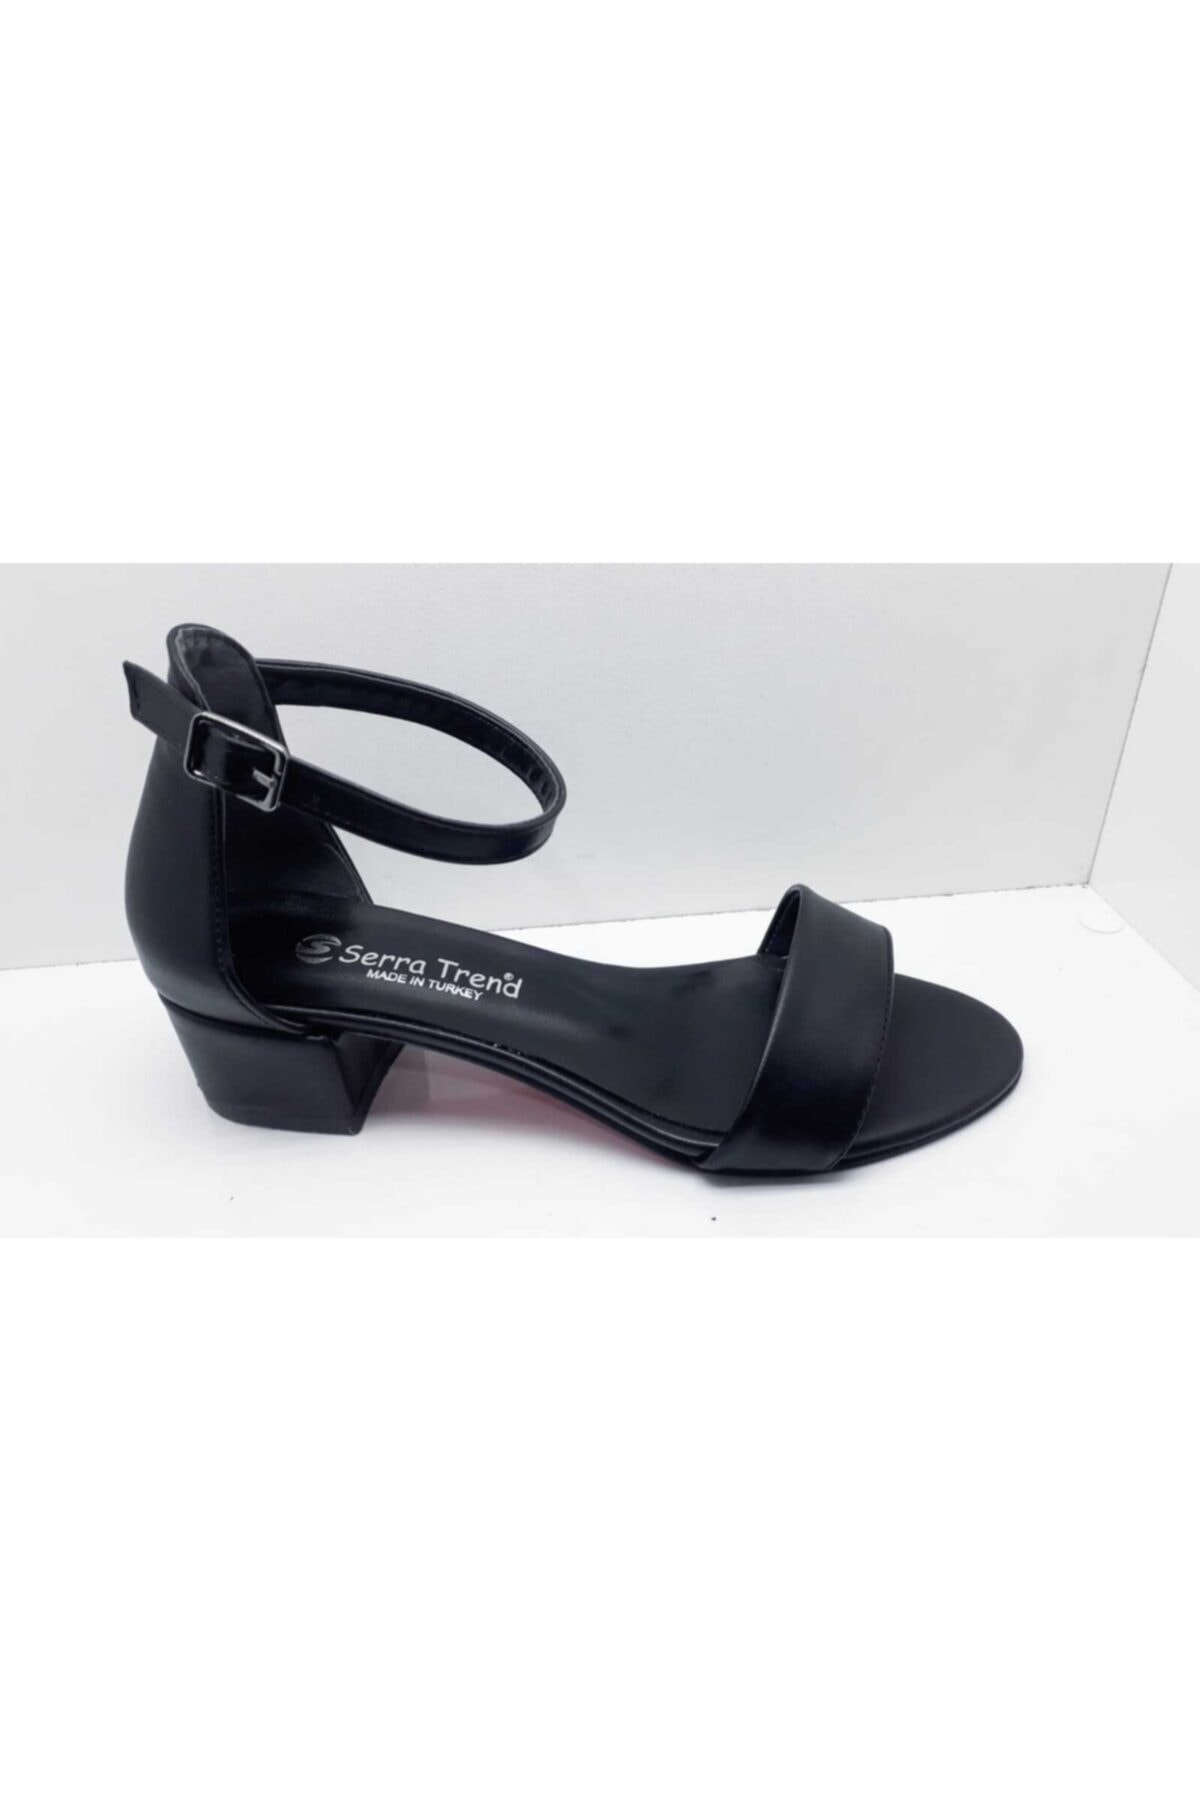 خرید مستقیم کفش پاشنه بلند مجلسی جدید SerraTrend رنگ مشکی کد ty92757405